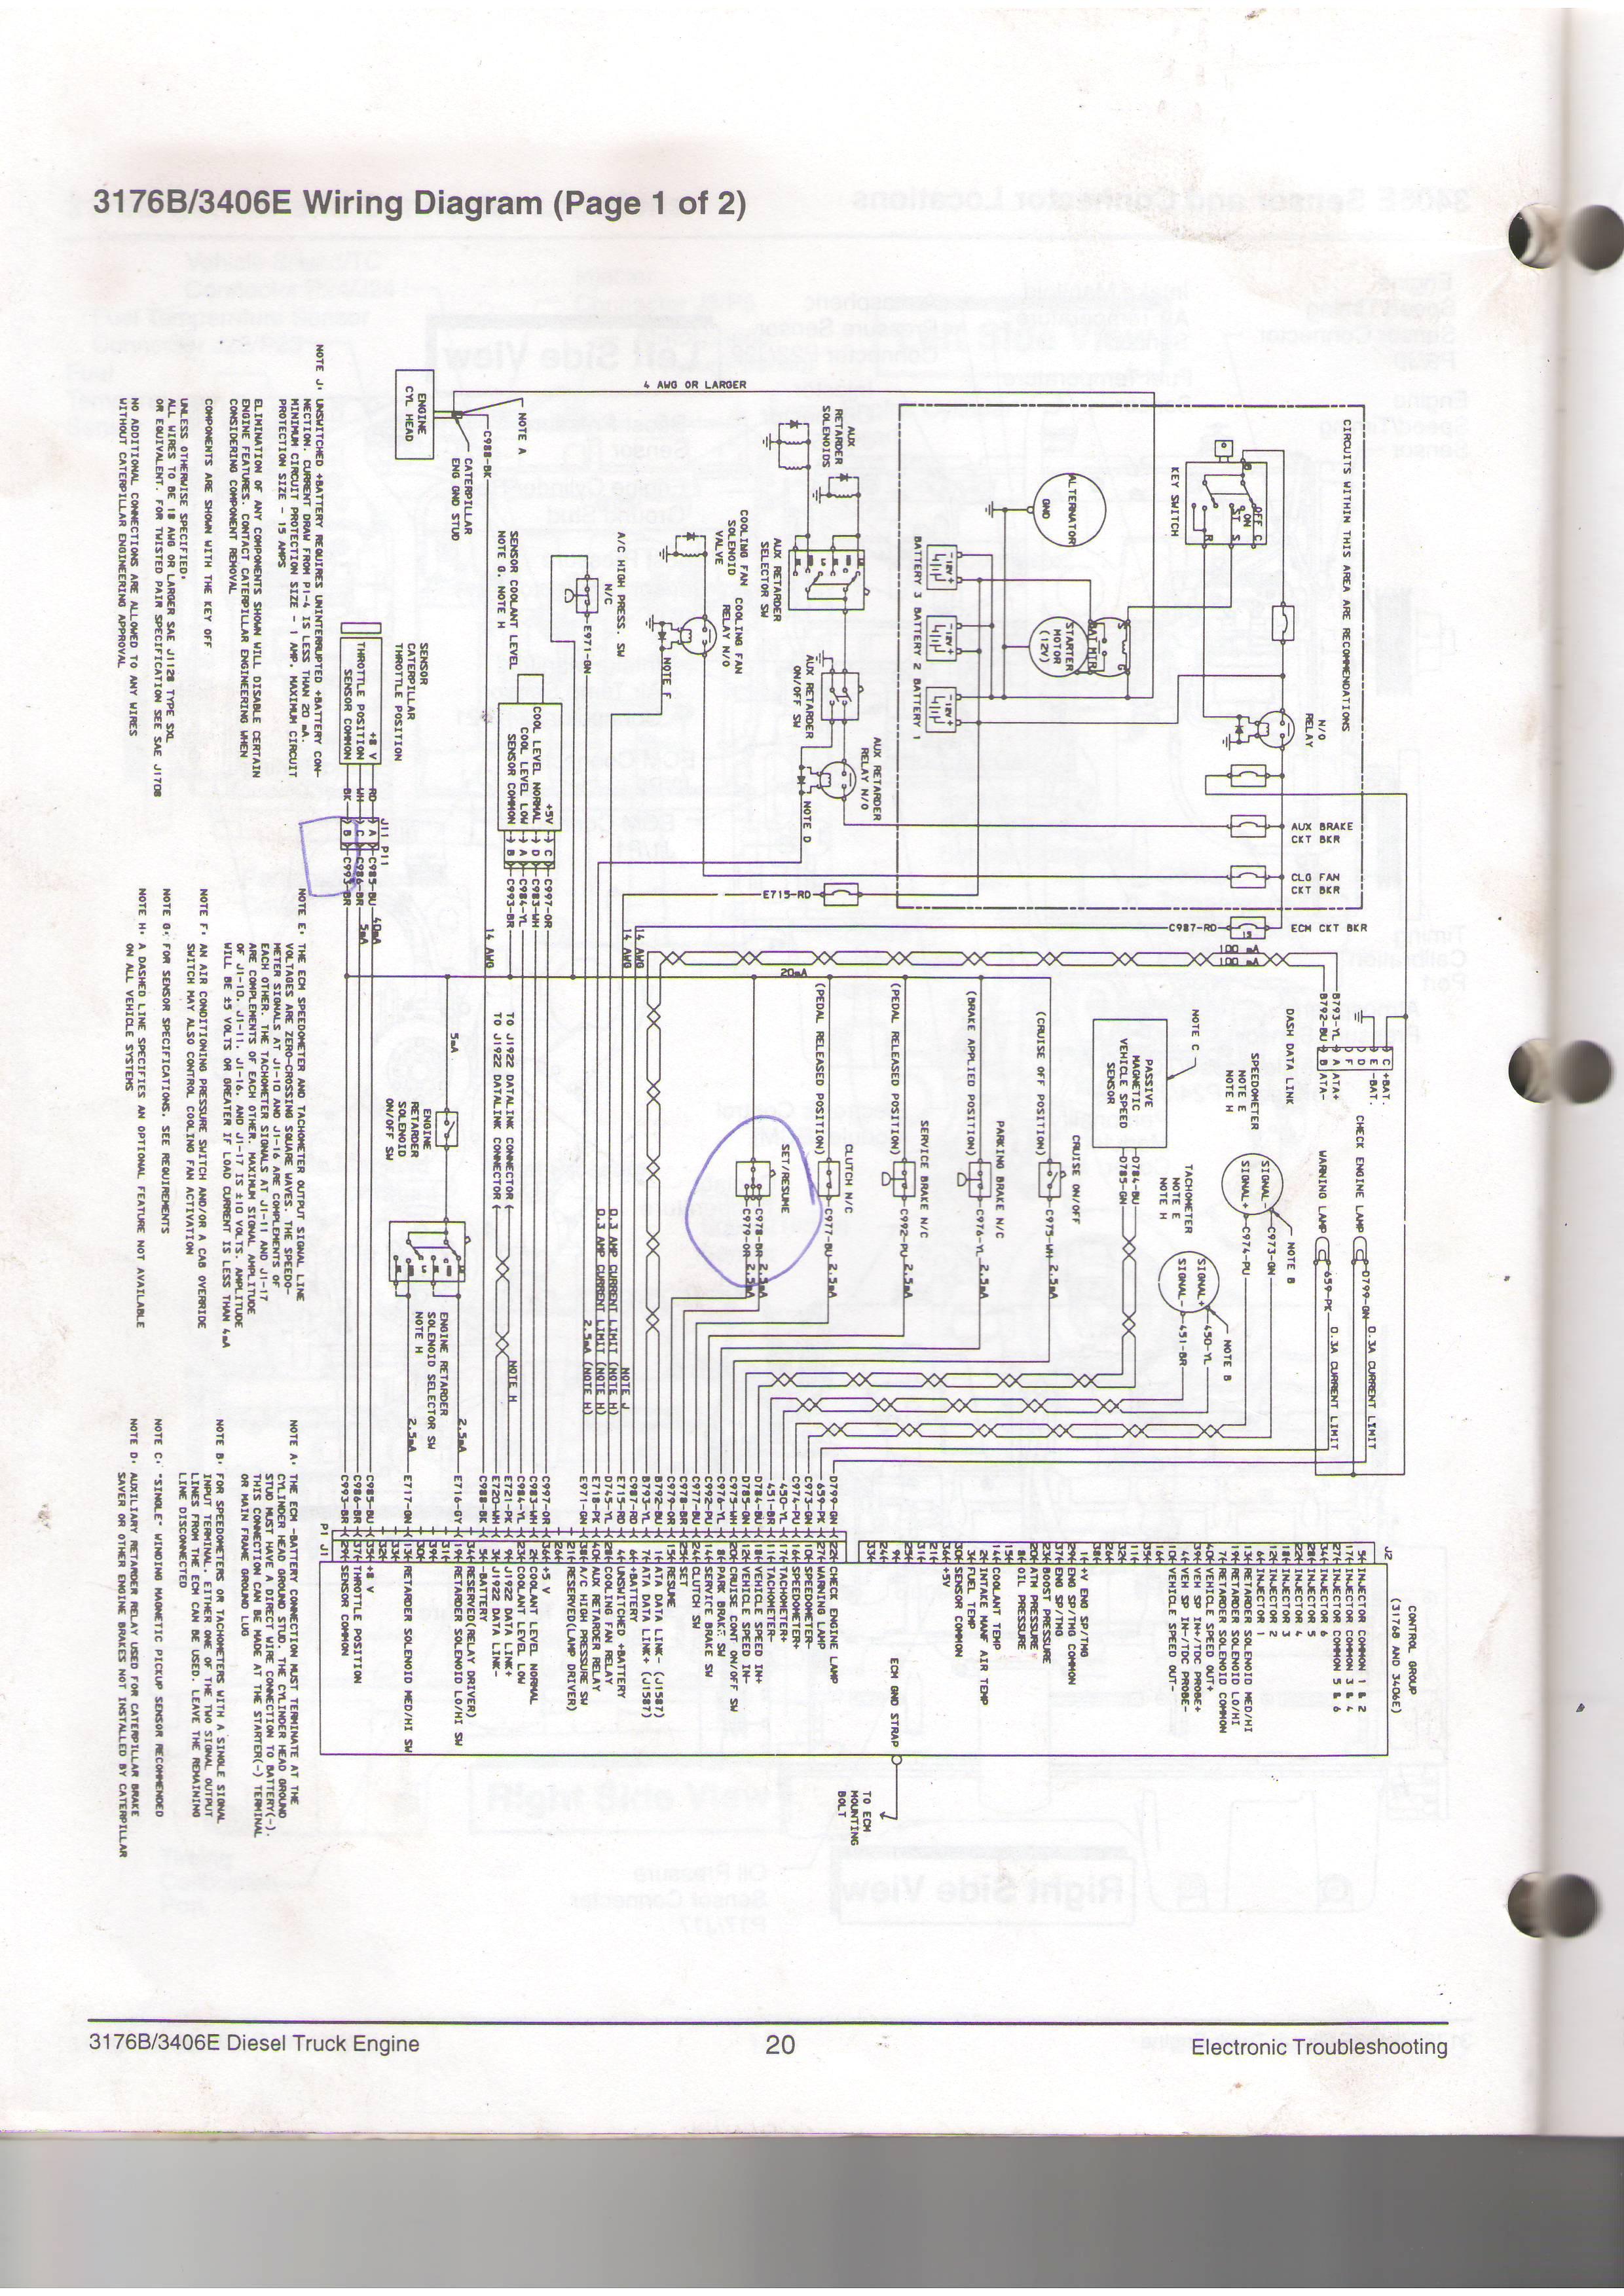 Throttle Position Sensor Wiring Diagram Moreover 2005 Nissan Maxima